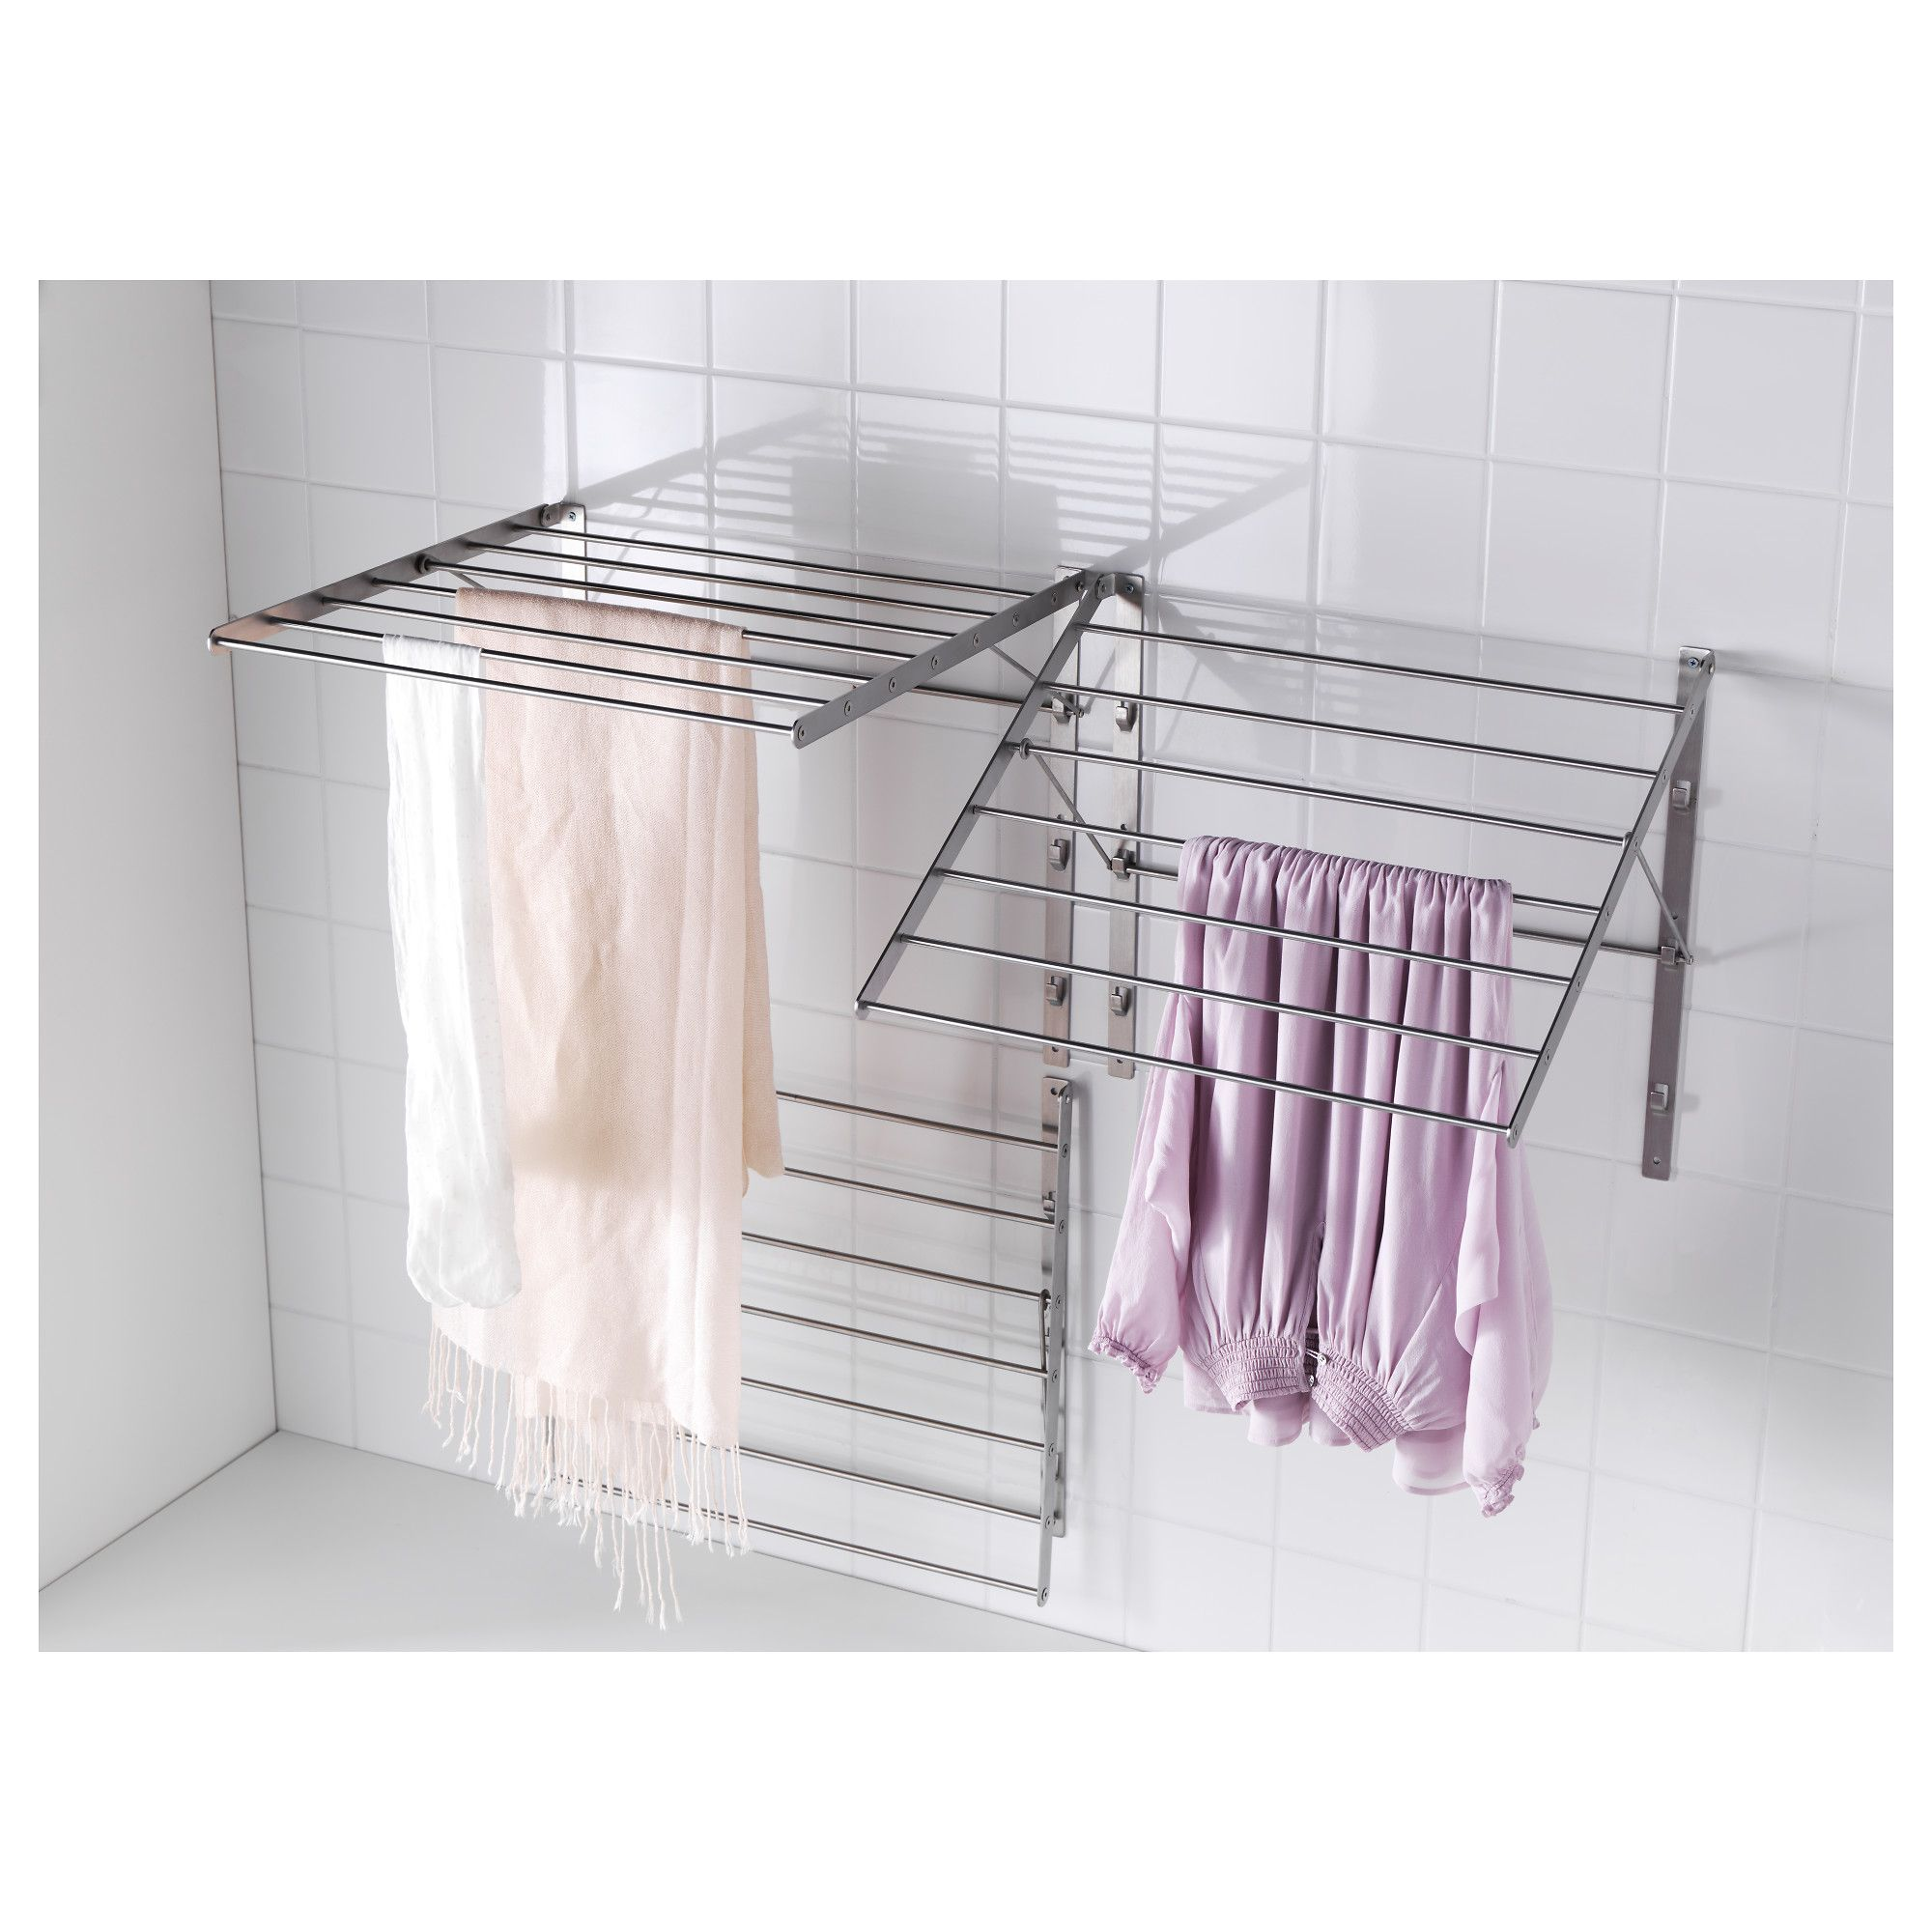 Ikea Grundtal Drying Rack Wall Adjustable To 3 Positions